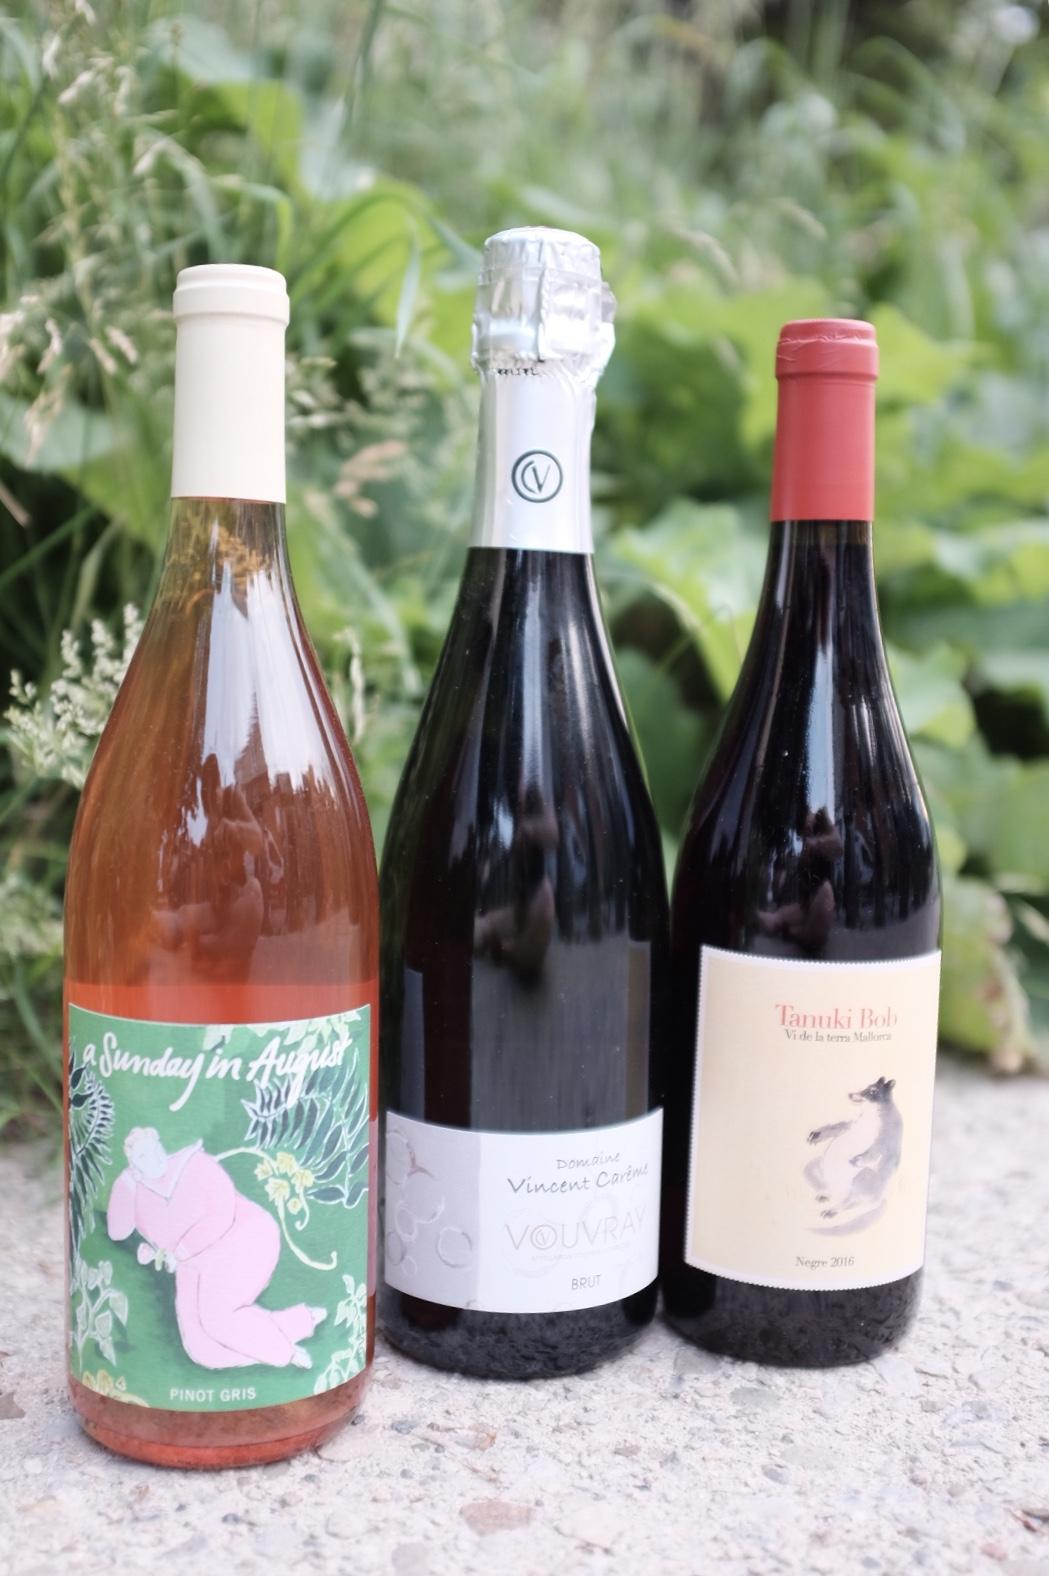 Fresh + Funky  A Sunday in August Pinot Gris, Vincent Carême Vouvray Brut, 4 Kilos Tanuki Bob